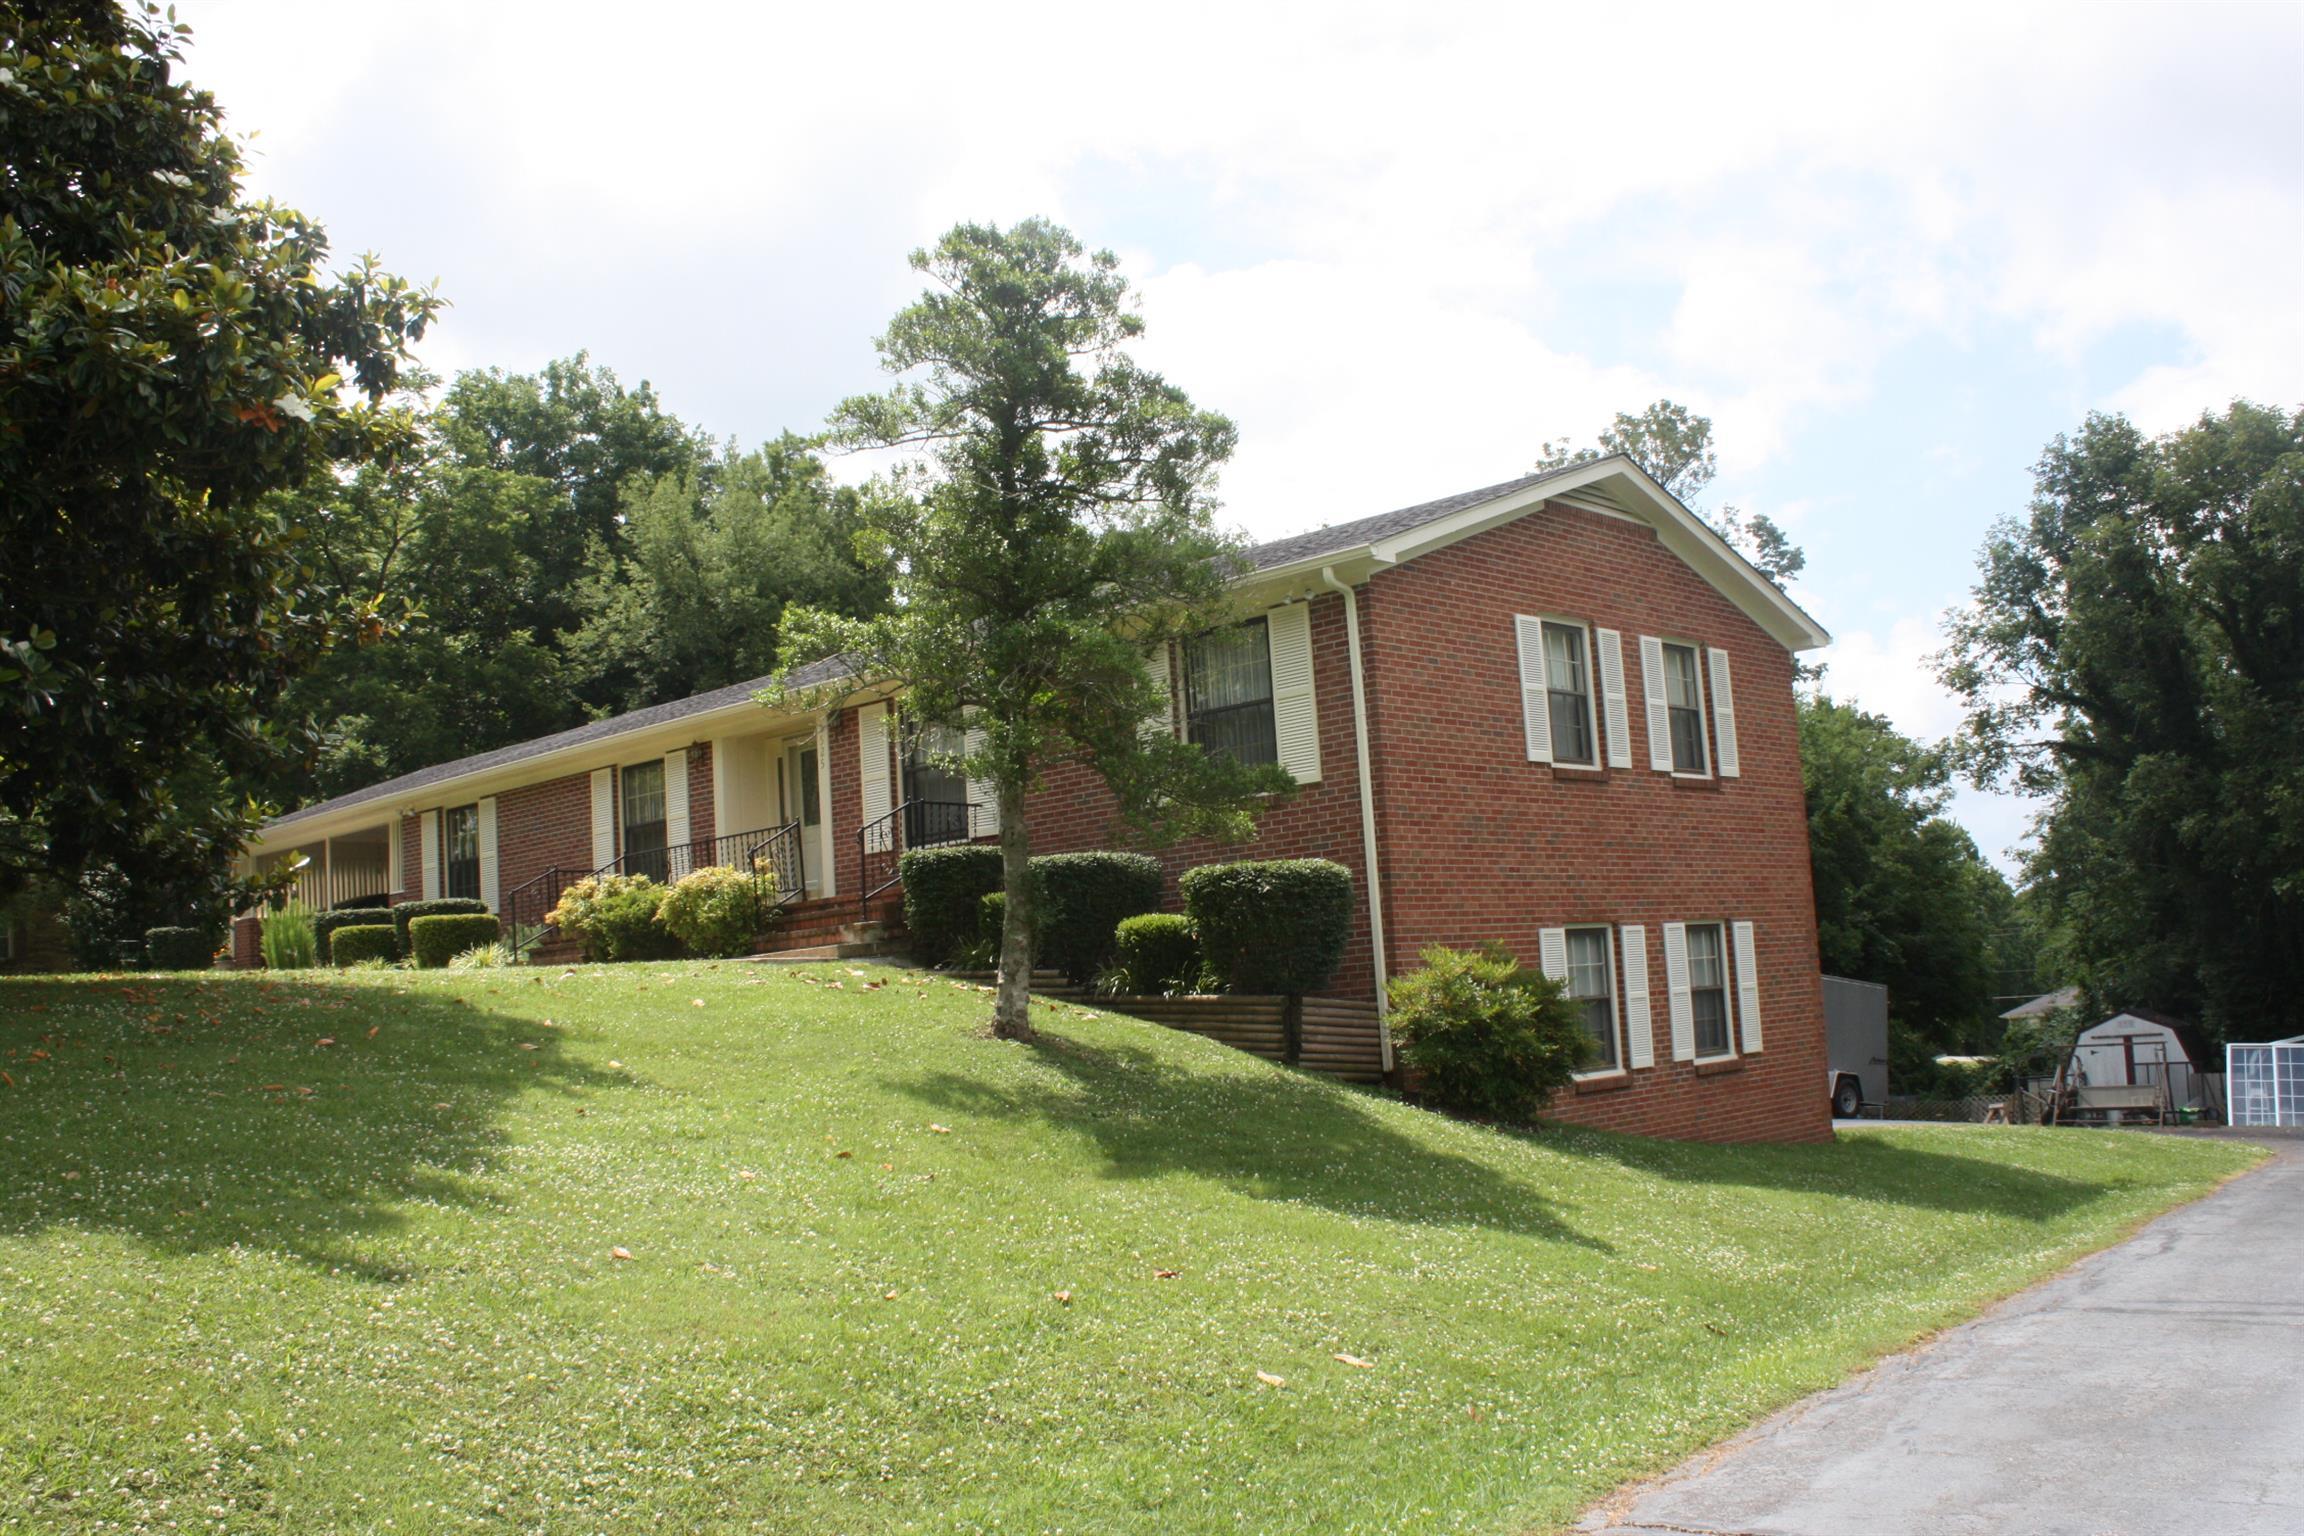 1525 Timberhill Dr, Lewisburg, TN 37091 - Lewisburg, TN real estate listing